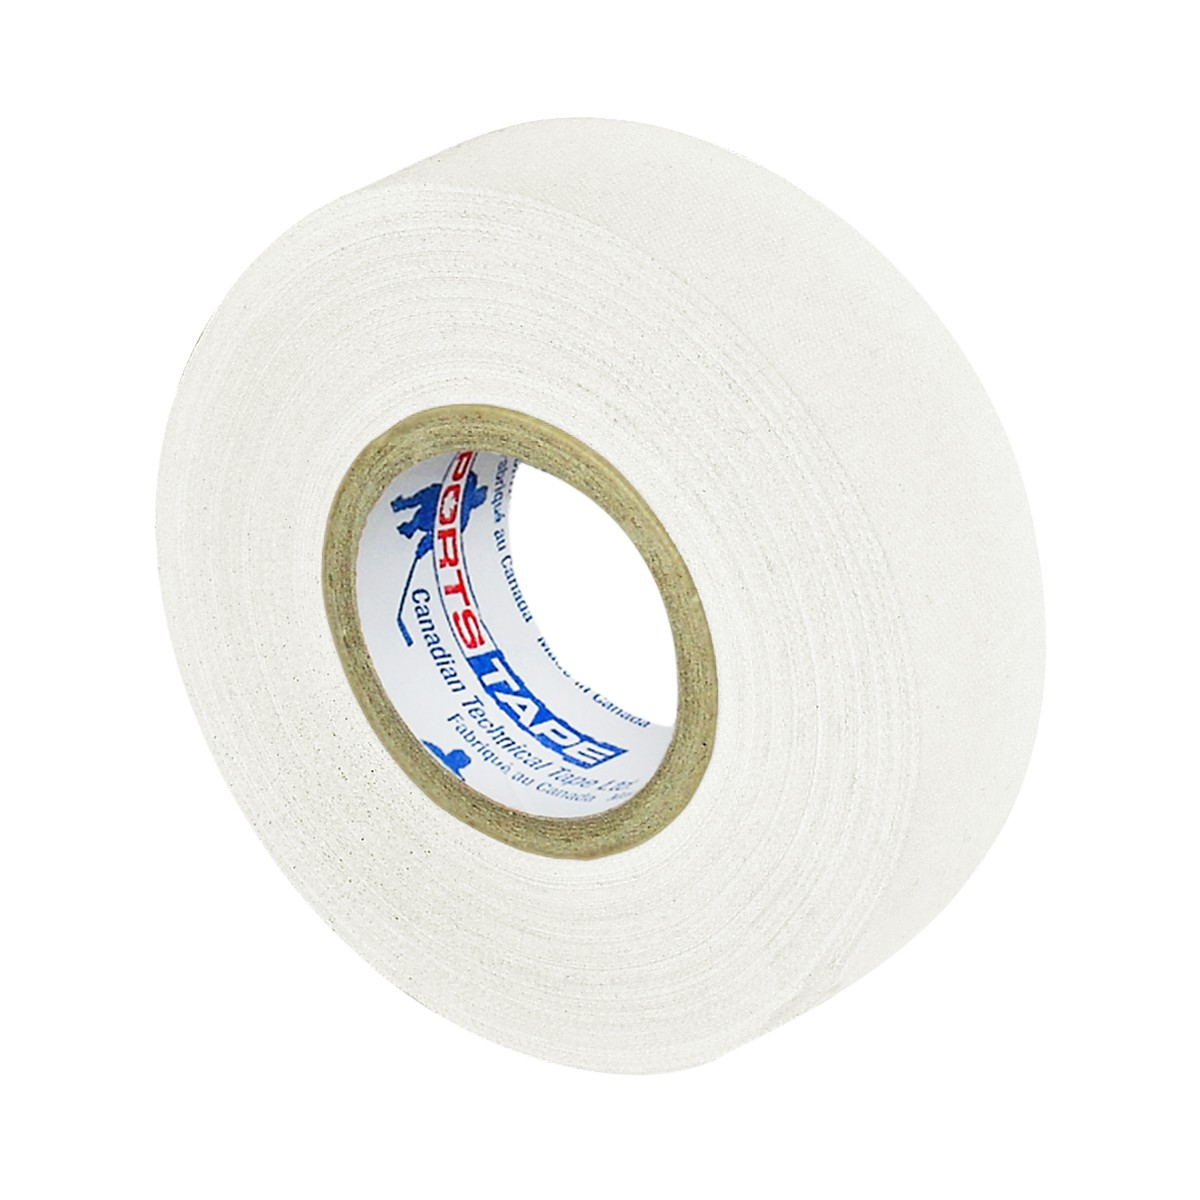 SPORTSTAPE Hockey Stick Tape 24MM X 18M